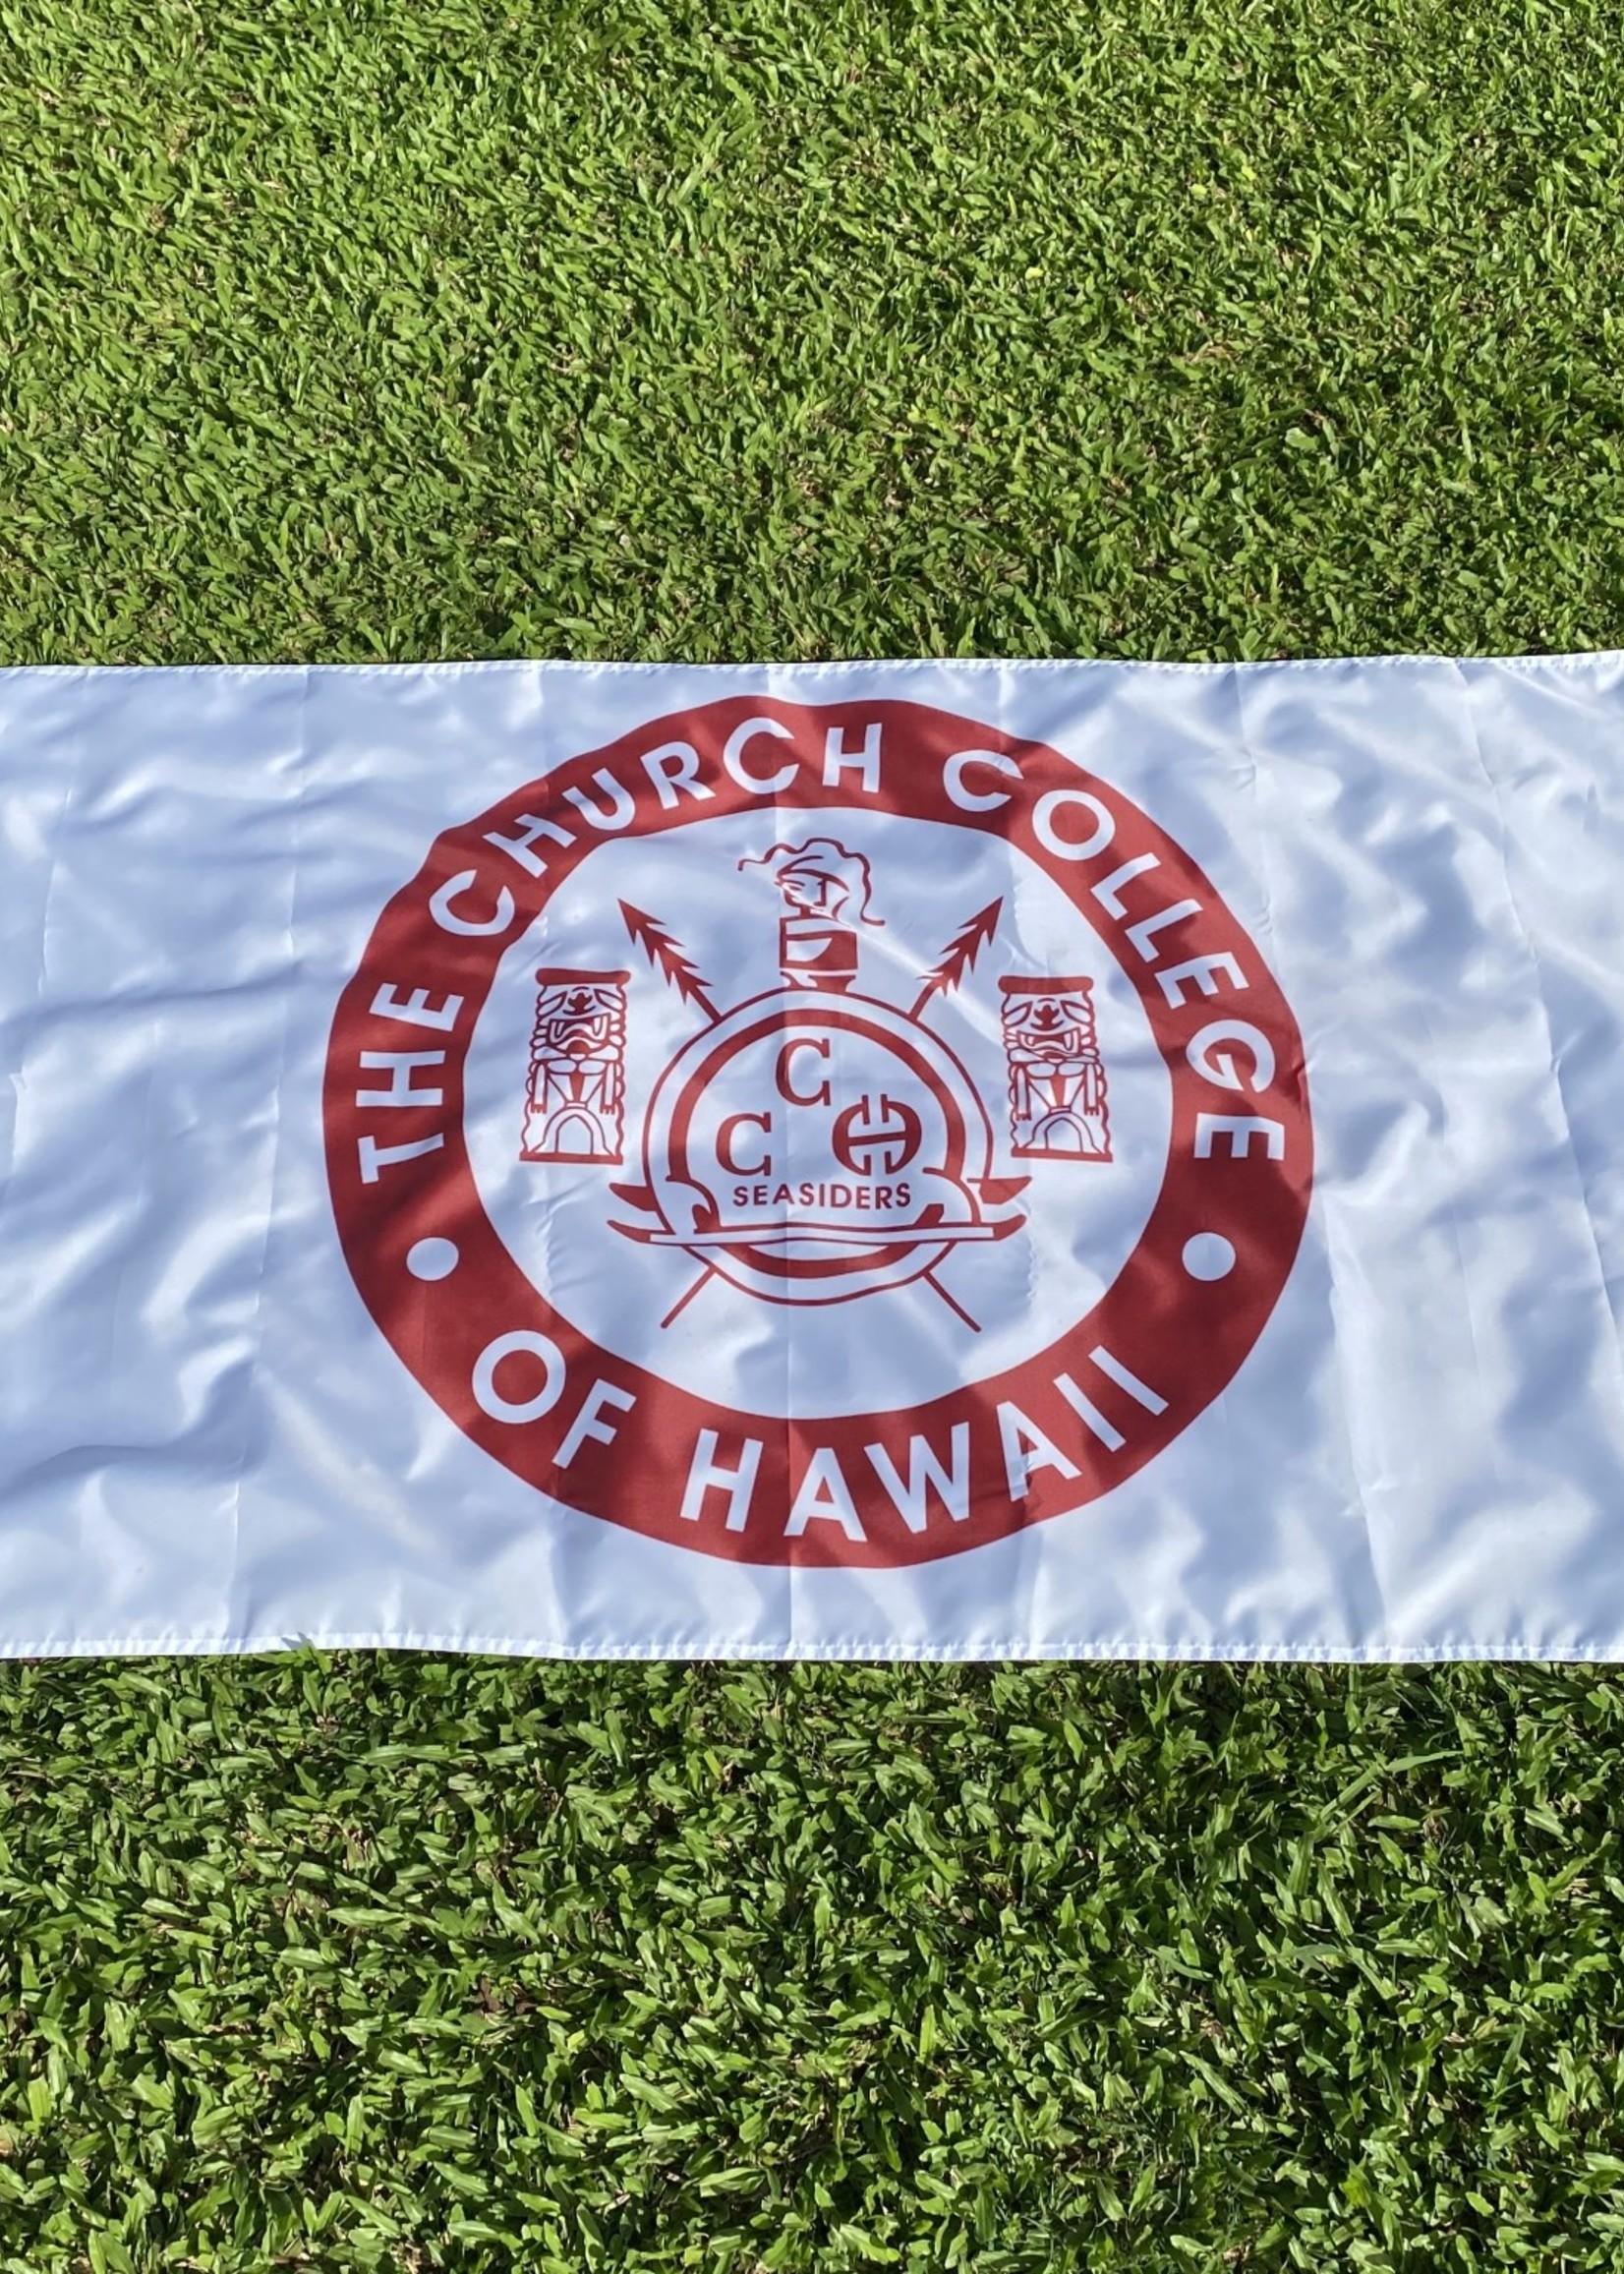 CCH Church College of Hawaii Flag 3'x5'